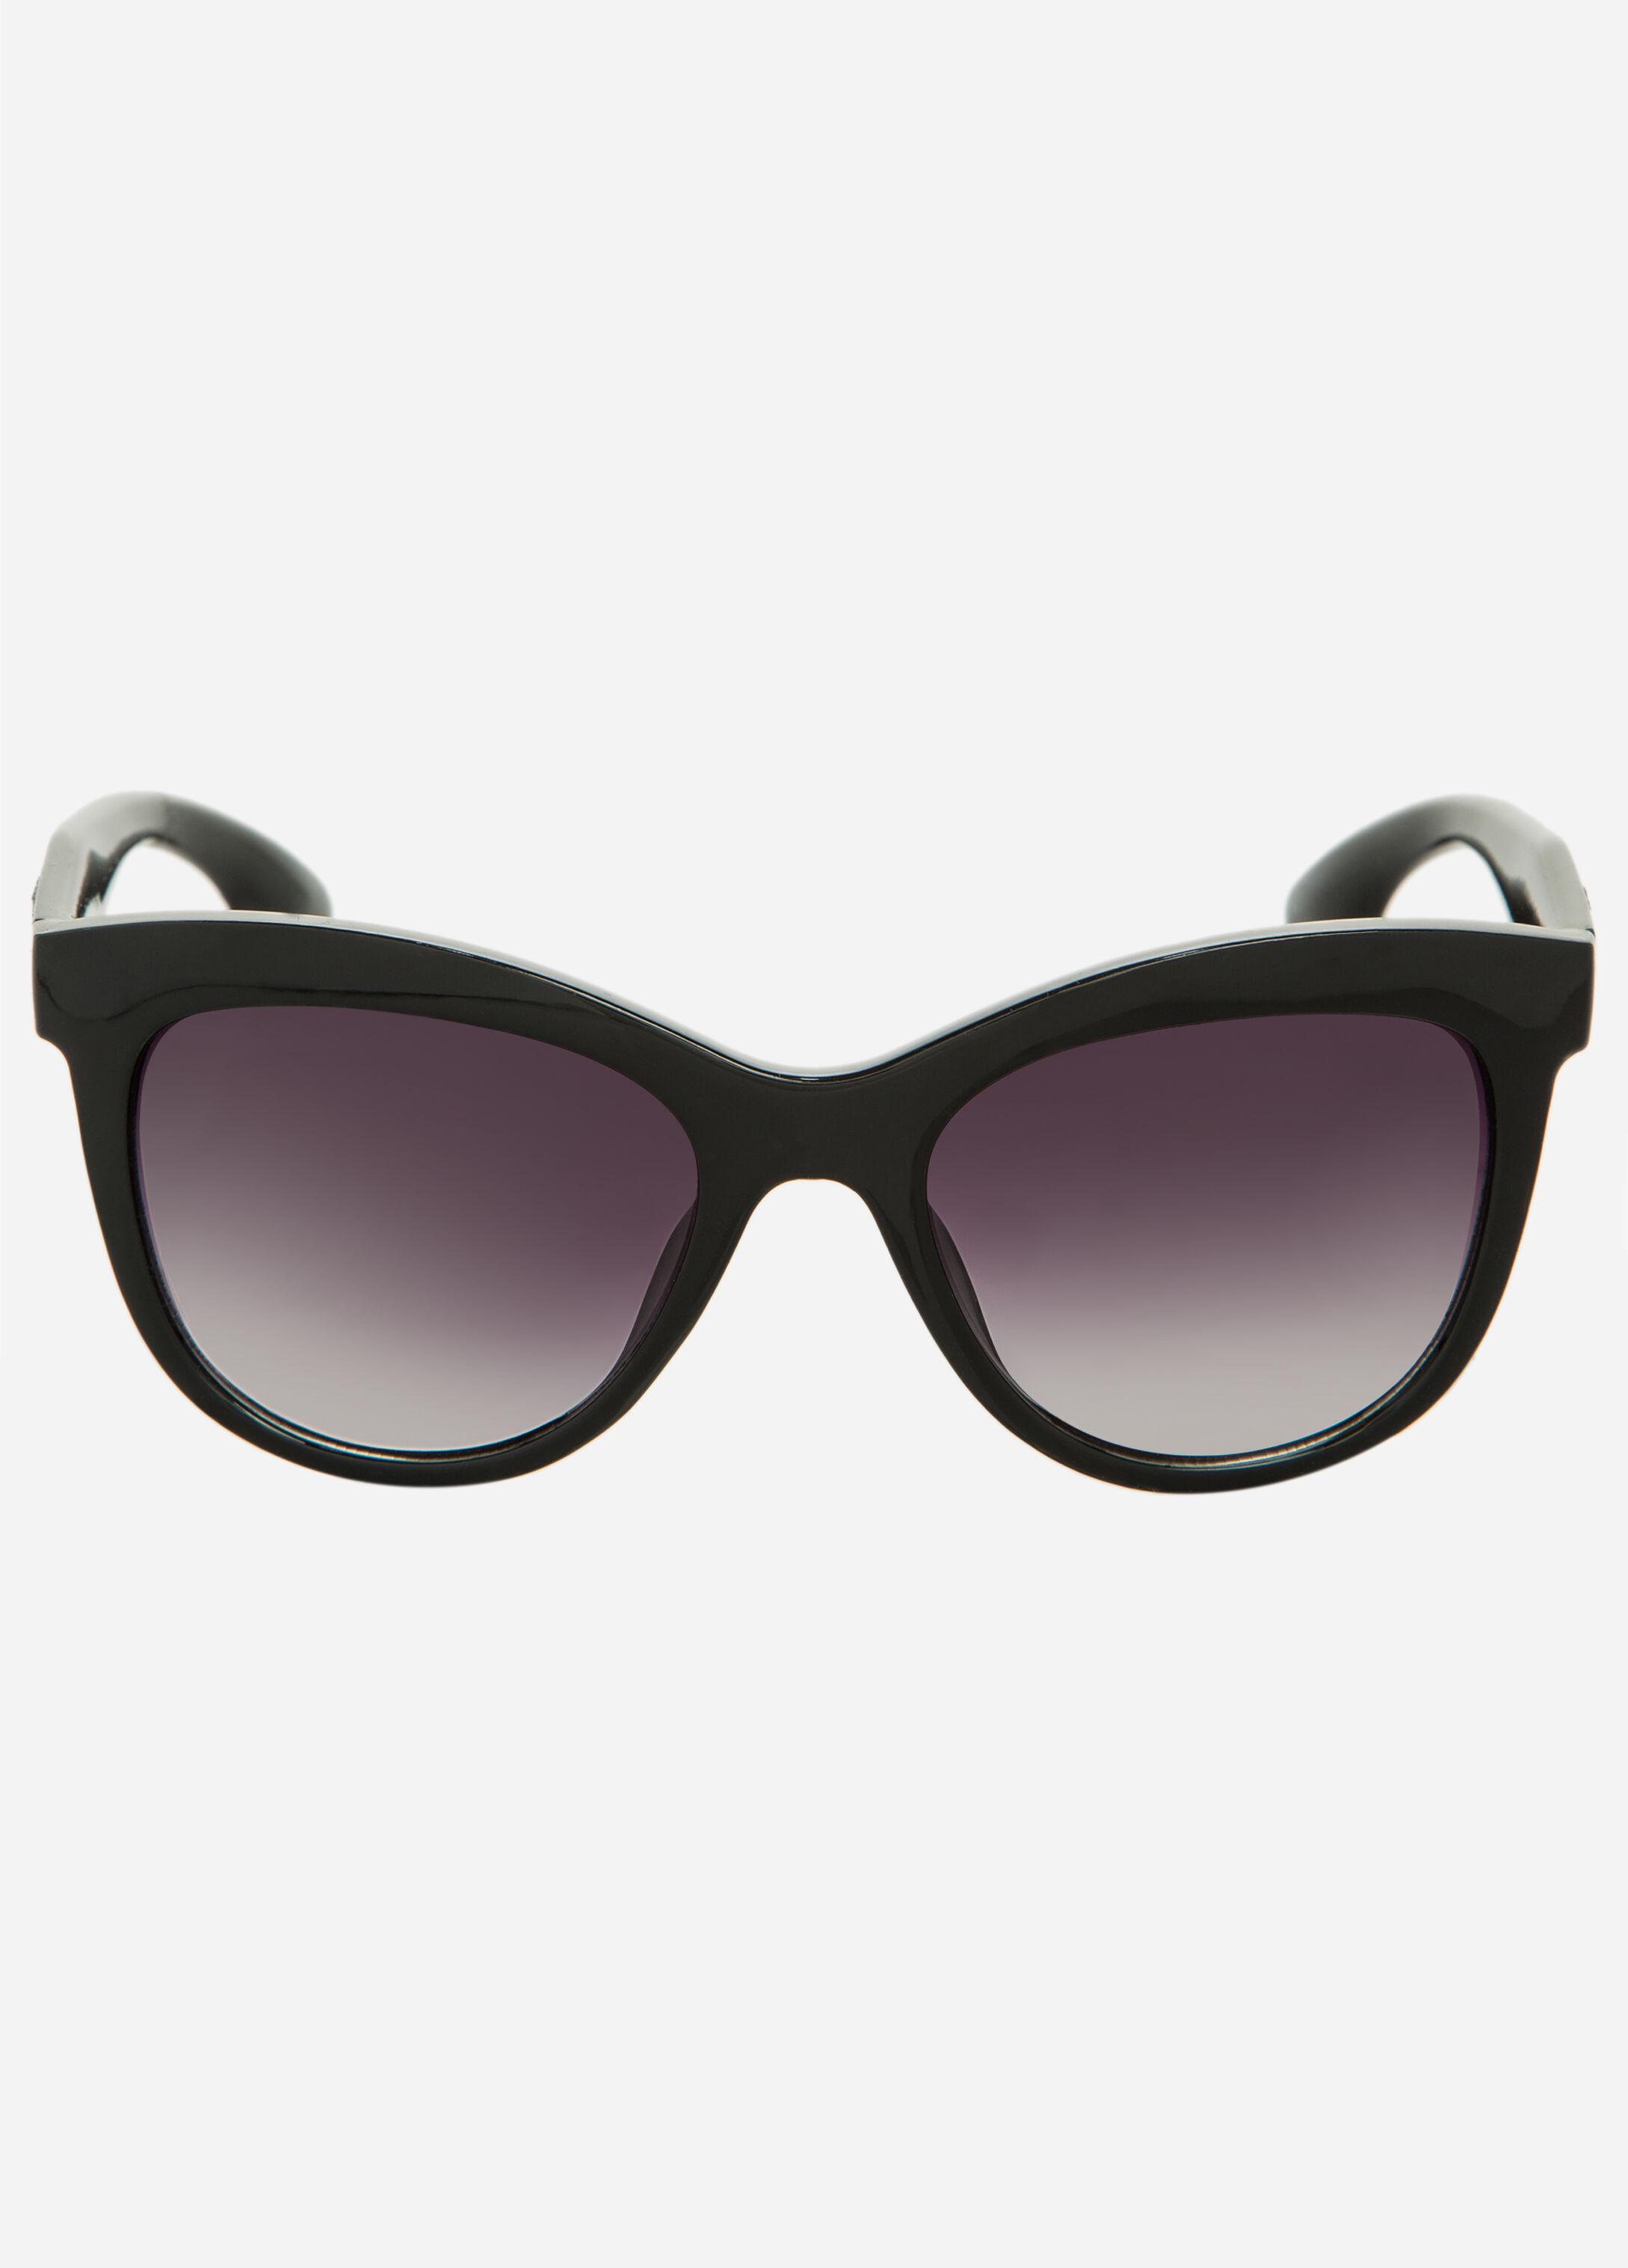 Sequin Temple Clubmaster Sunglasses